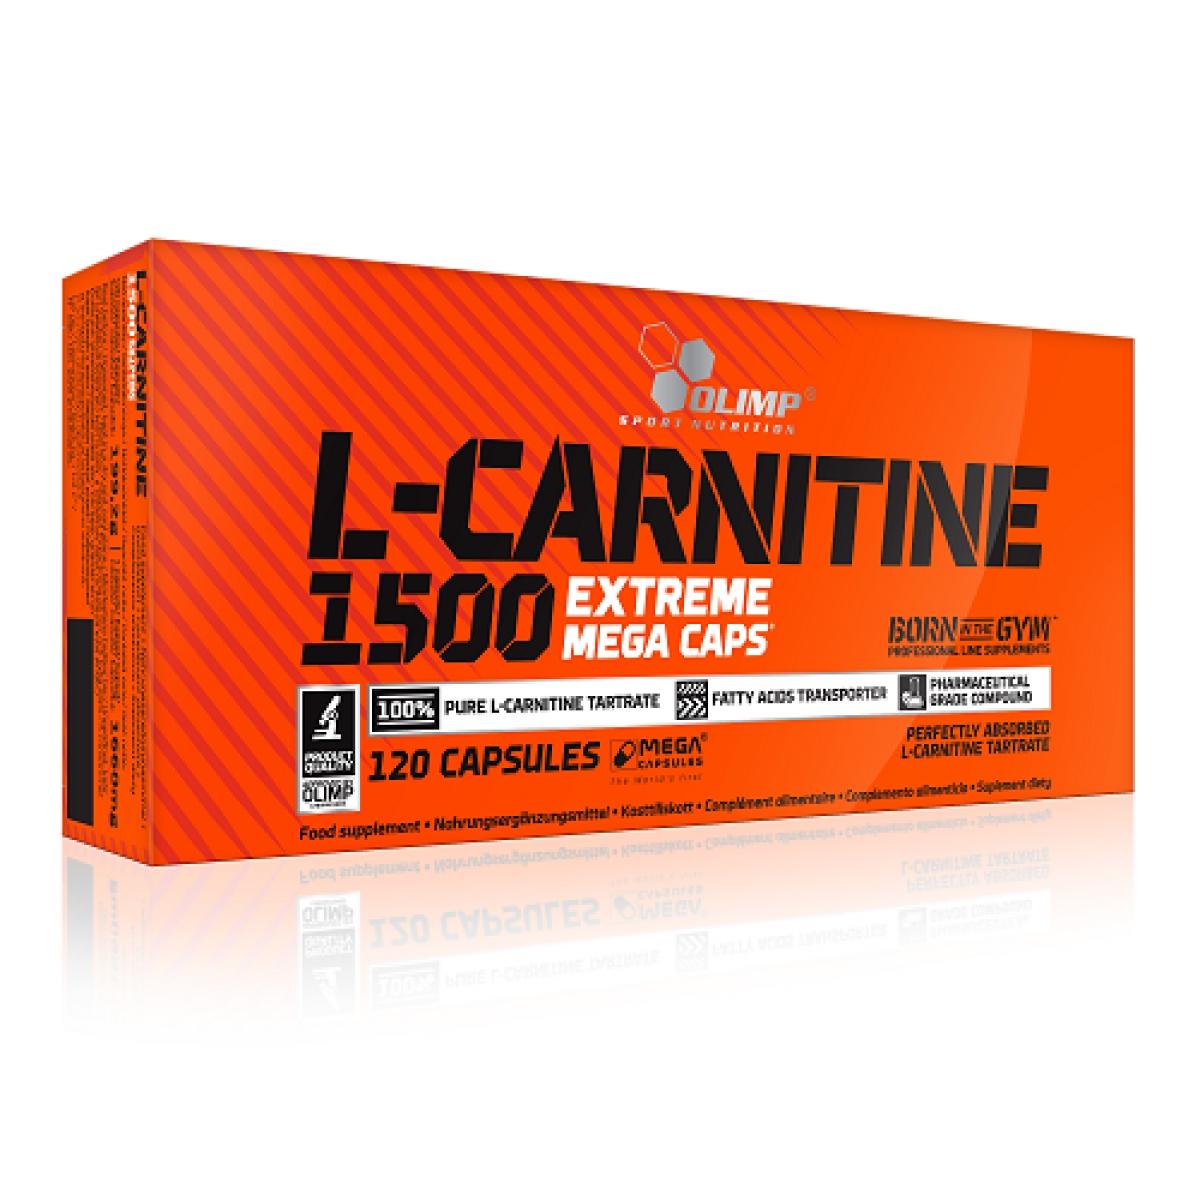 L-CARNITINE 1500, 120 KAPSUL